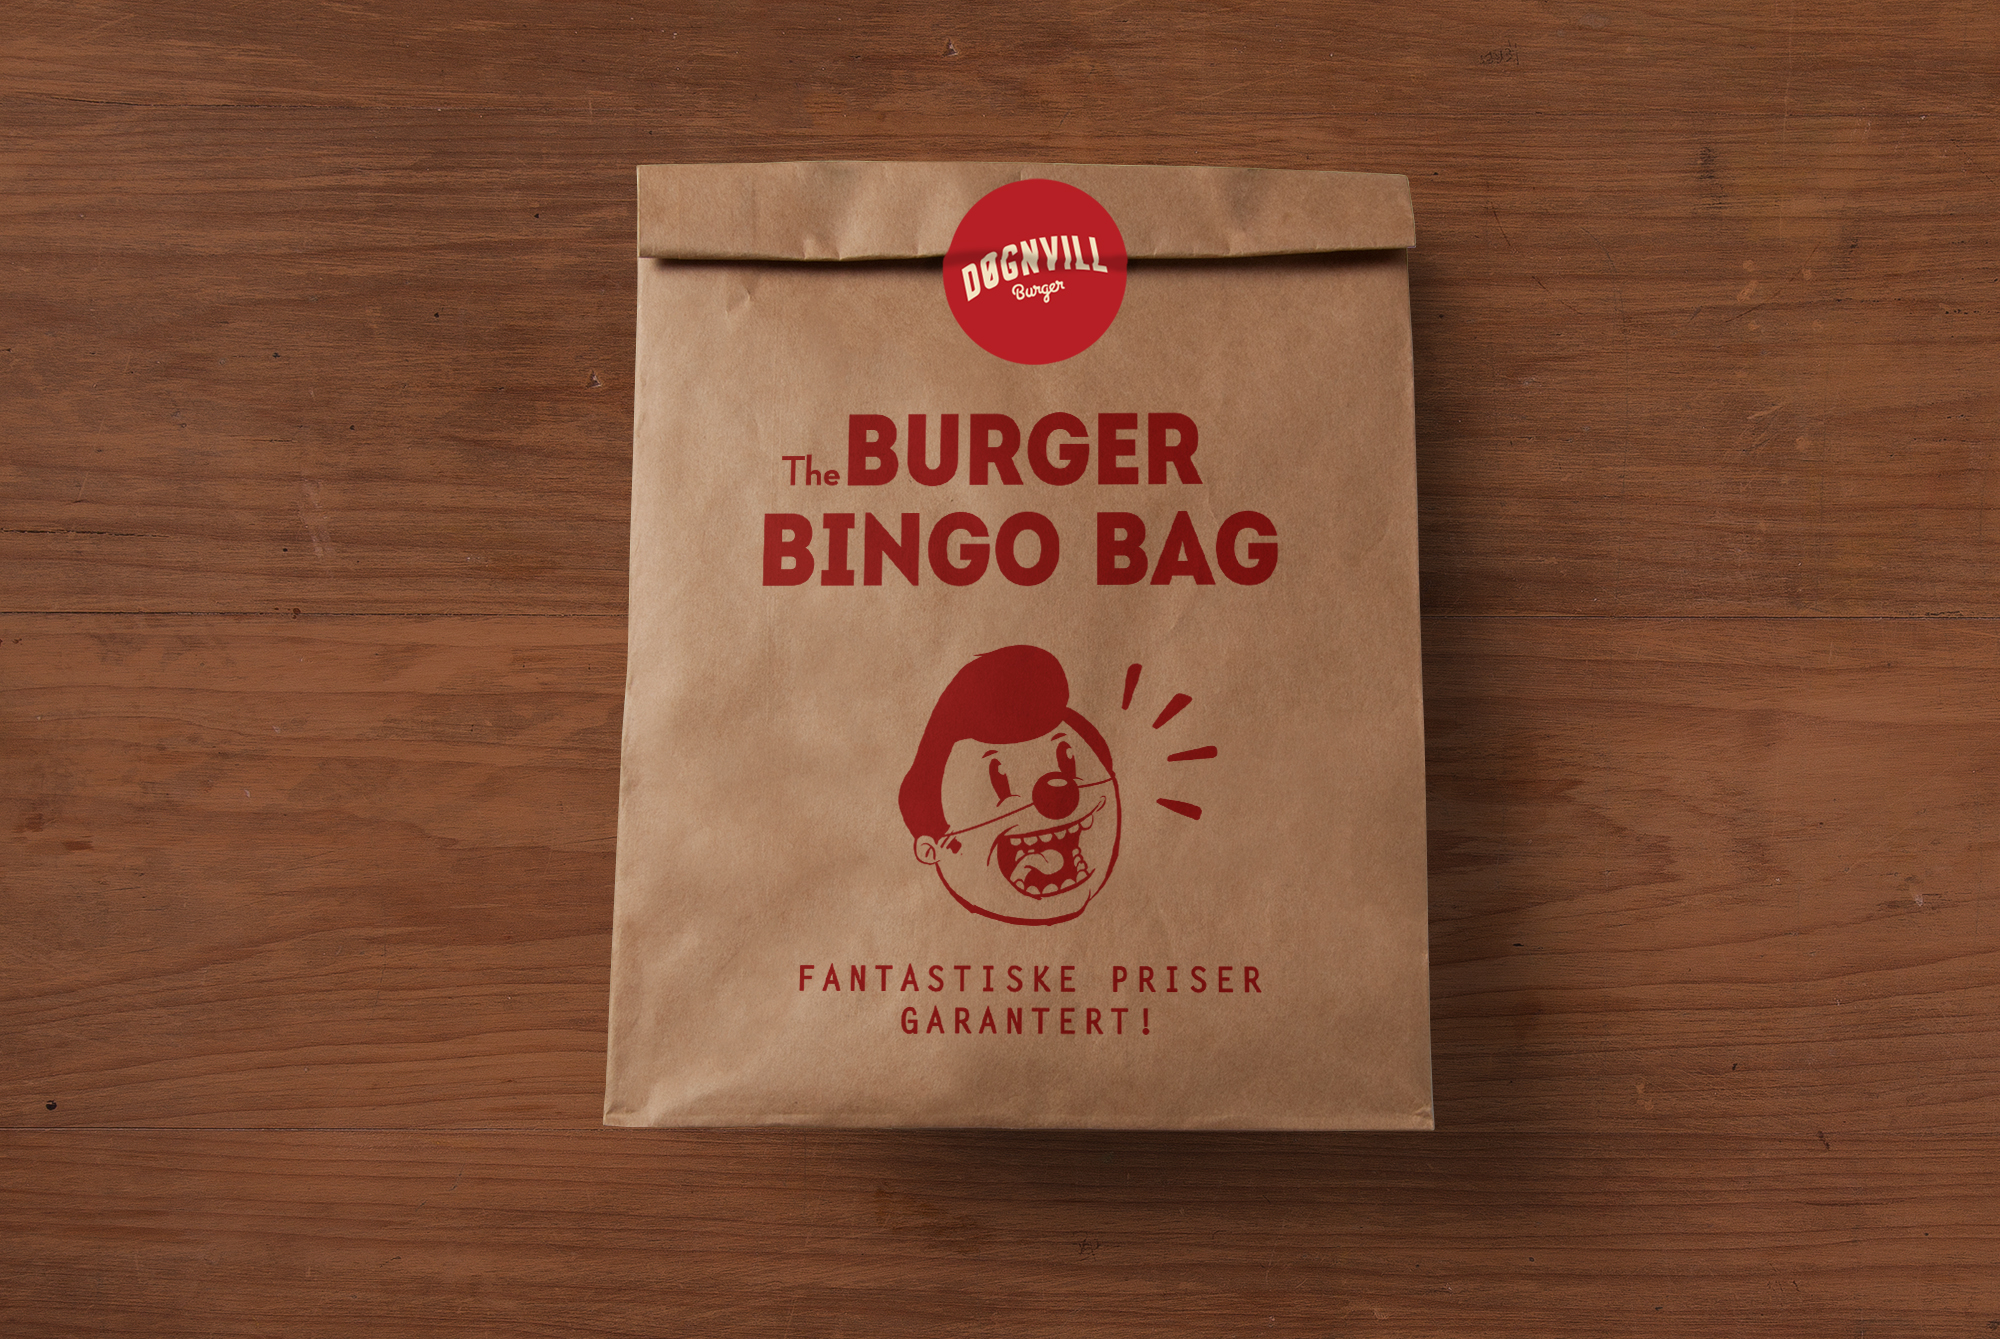 Døgnvill Burger - Burger Bingo Bag